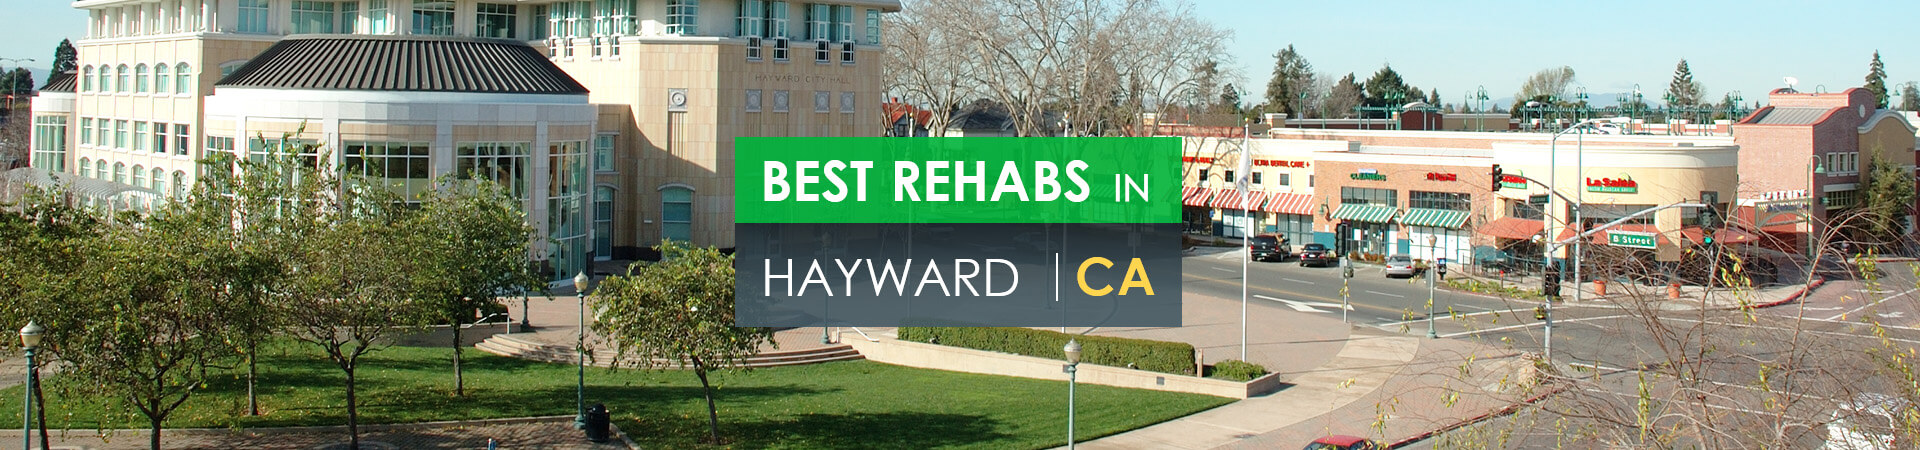 Best rehabs in Hayward, CA